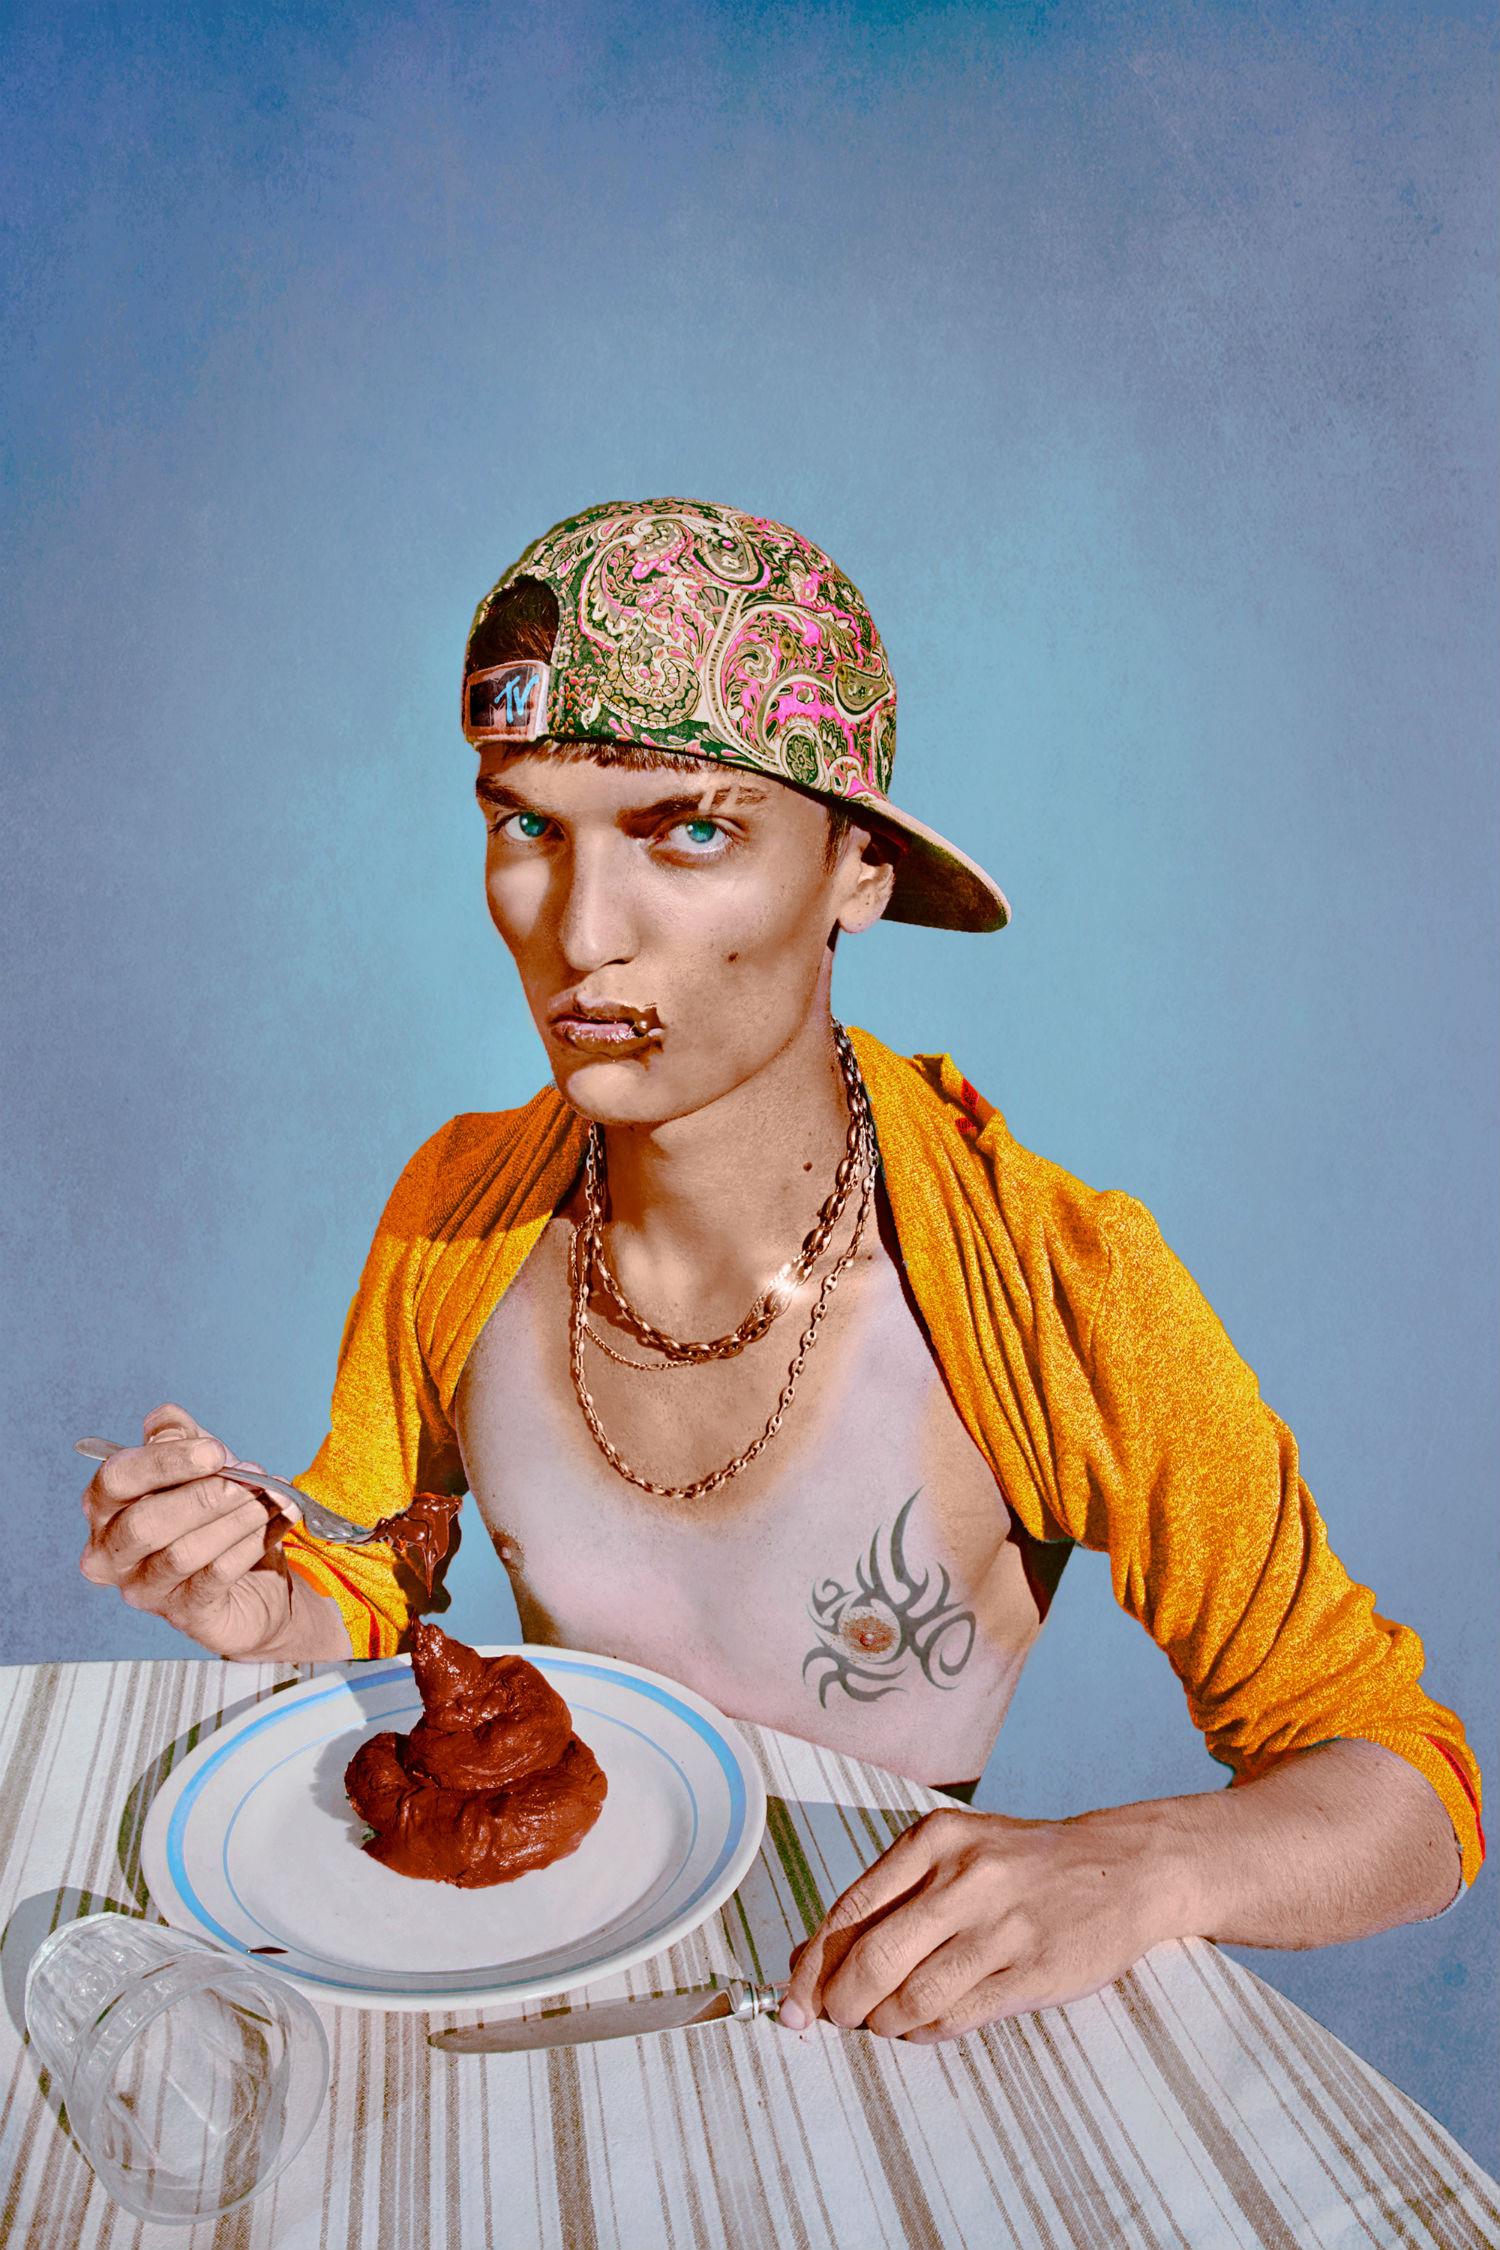 marwane pallas photographing graphic portraits body horror